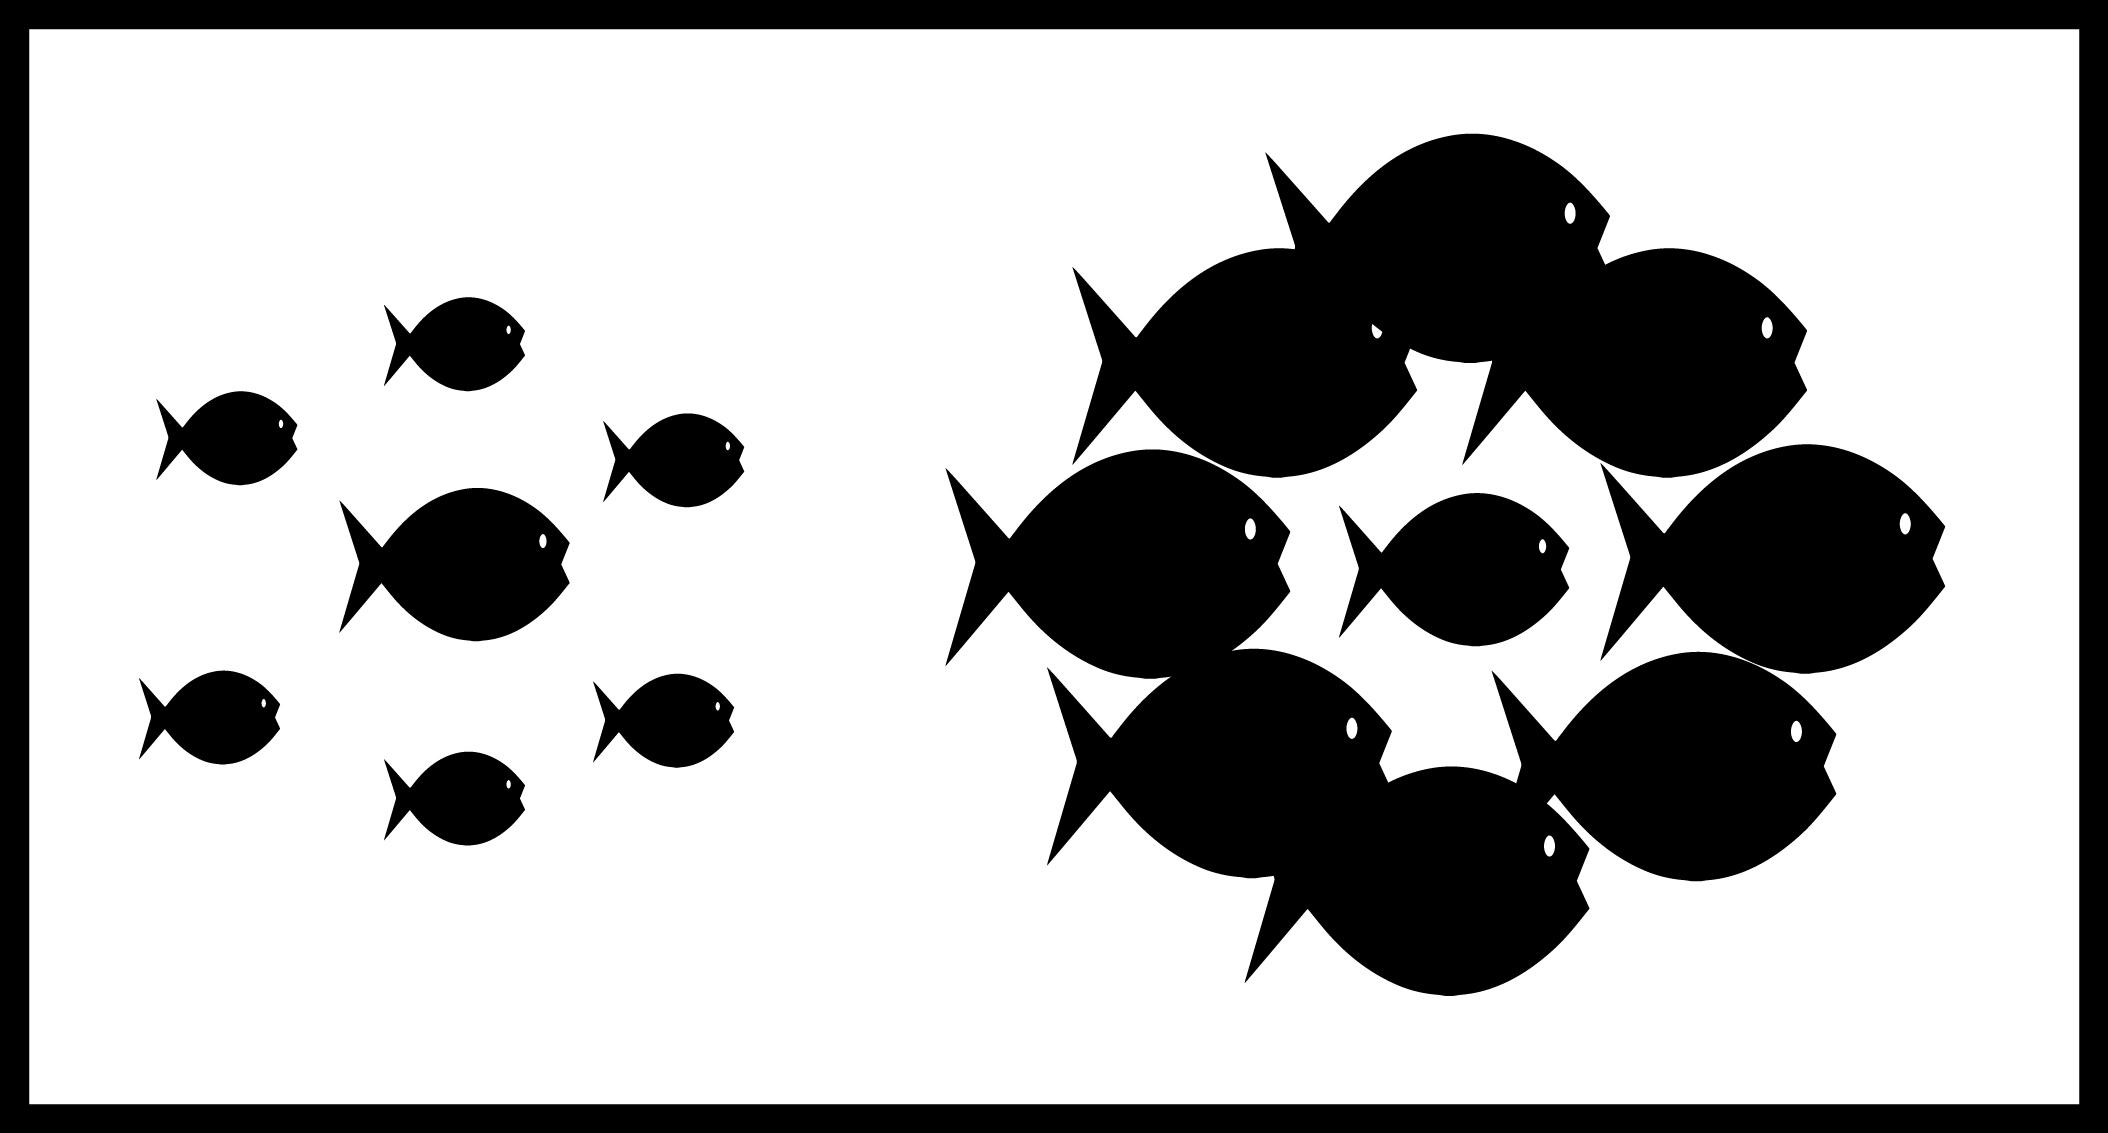 size-illusion